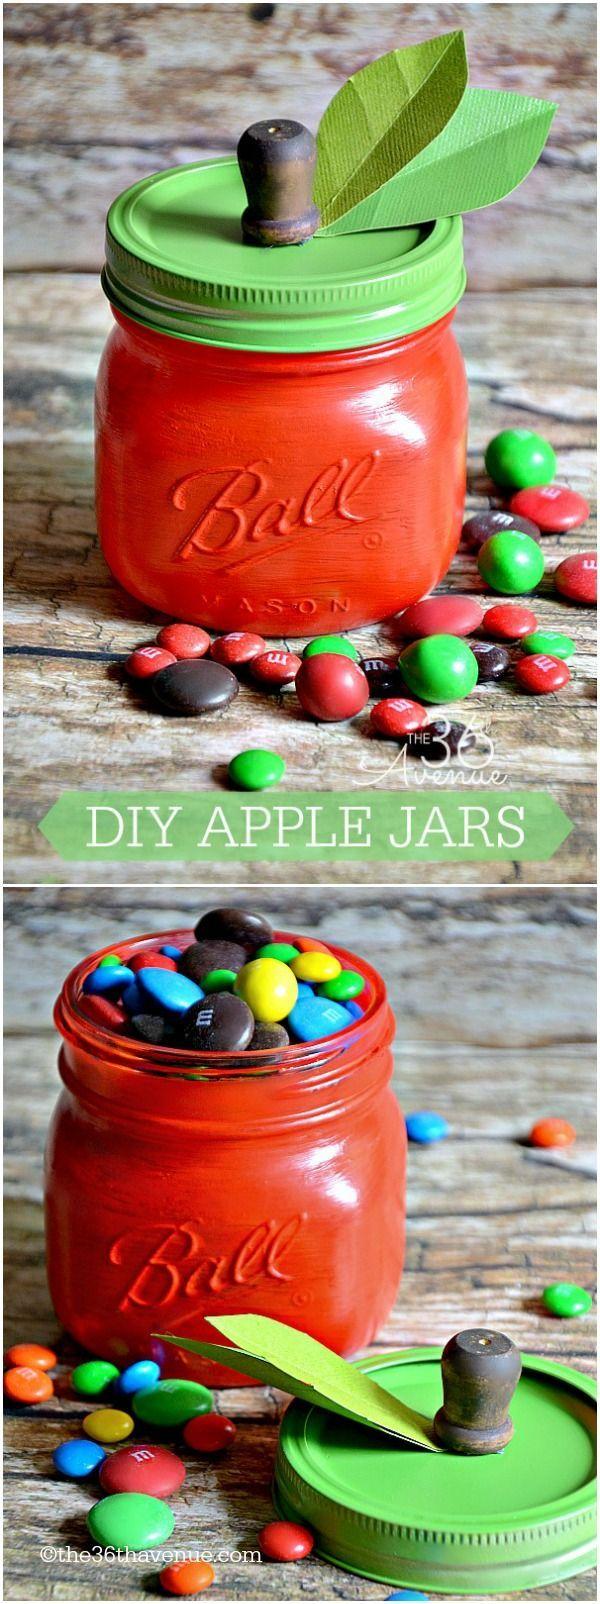 1426 best Mason Jar Crafts images on Pinterest | A rainbow, Crafts ...